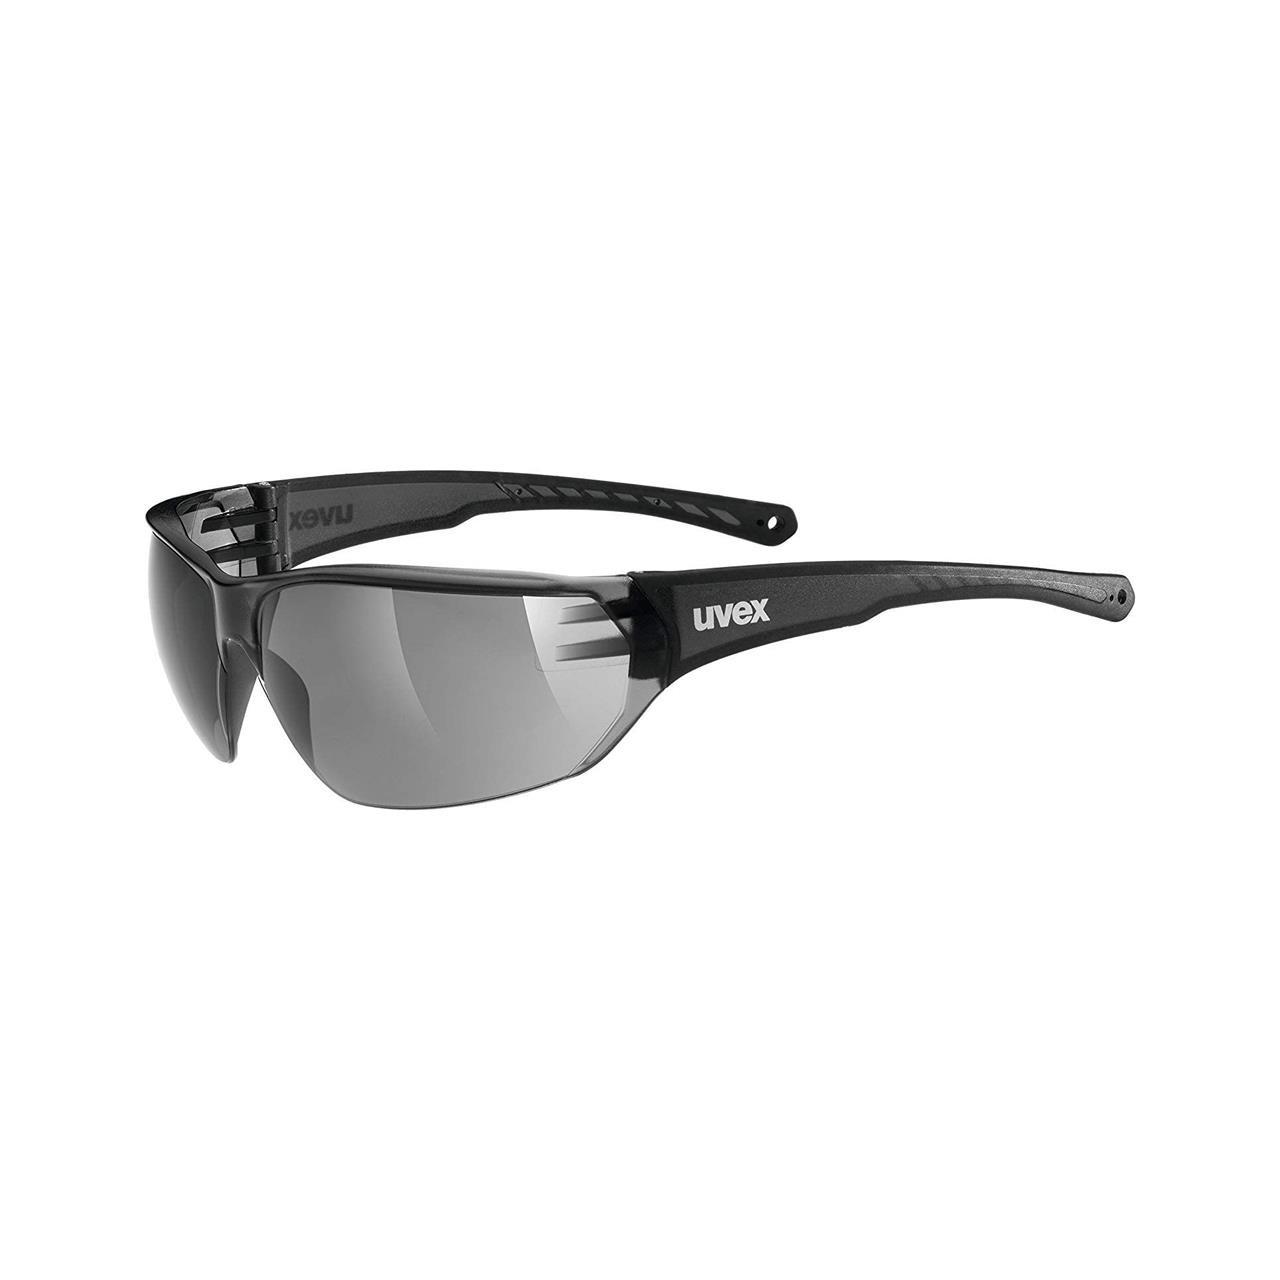 Uvex Sportstyle Glasses (204)